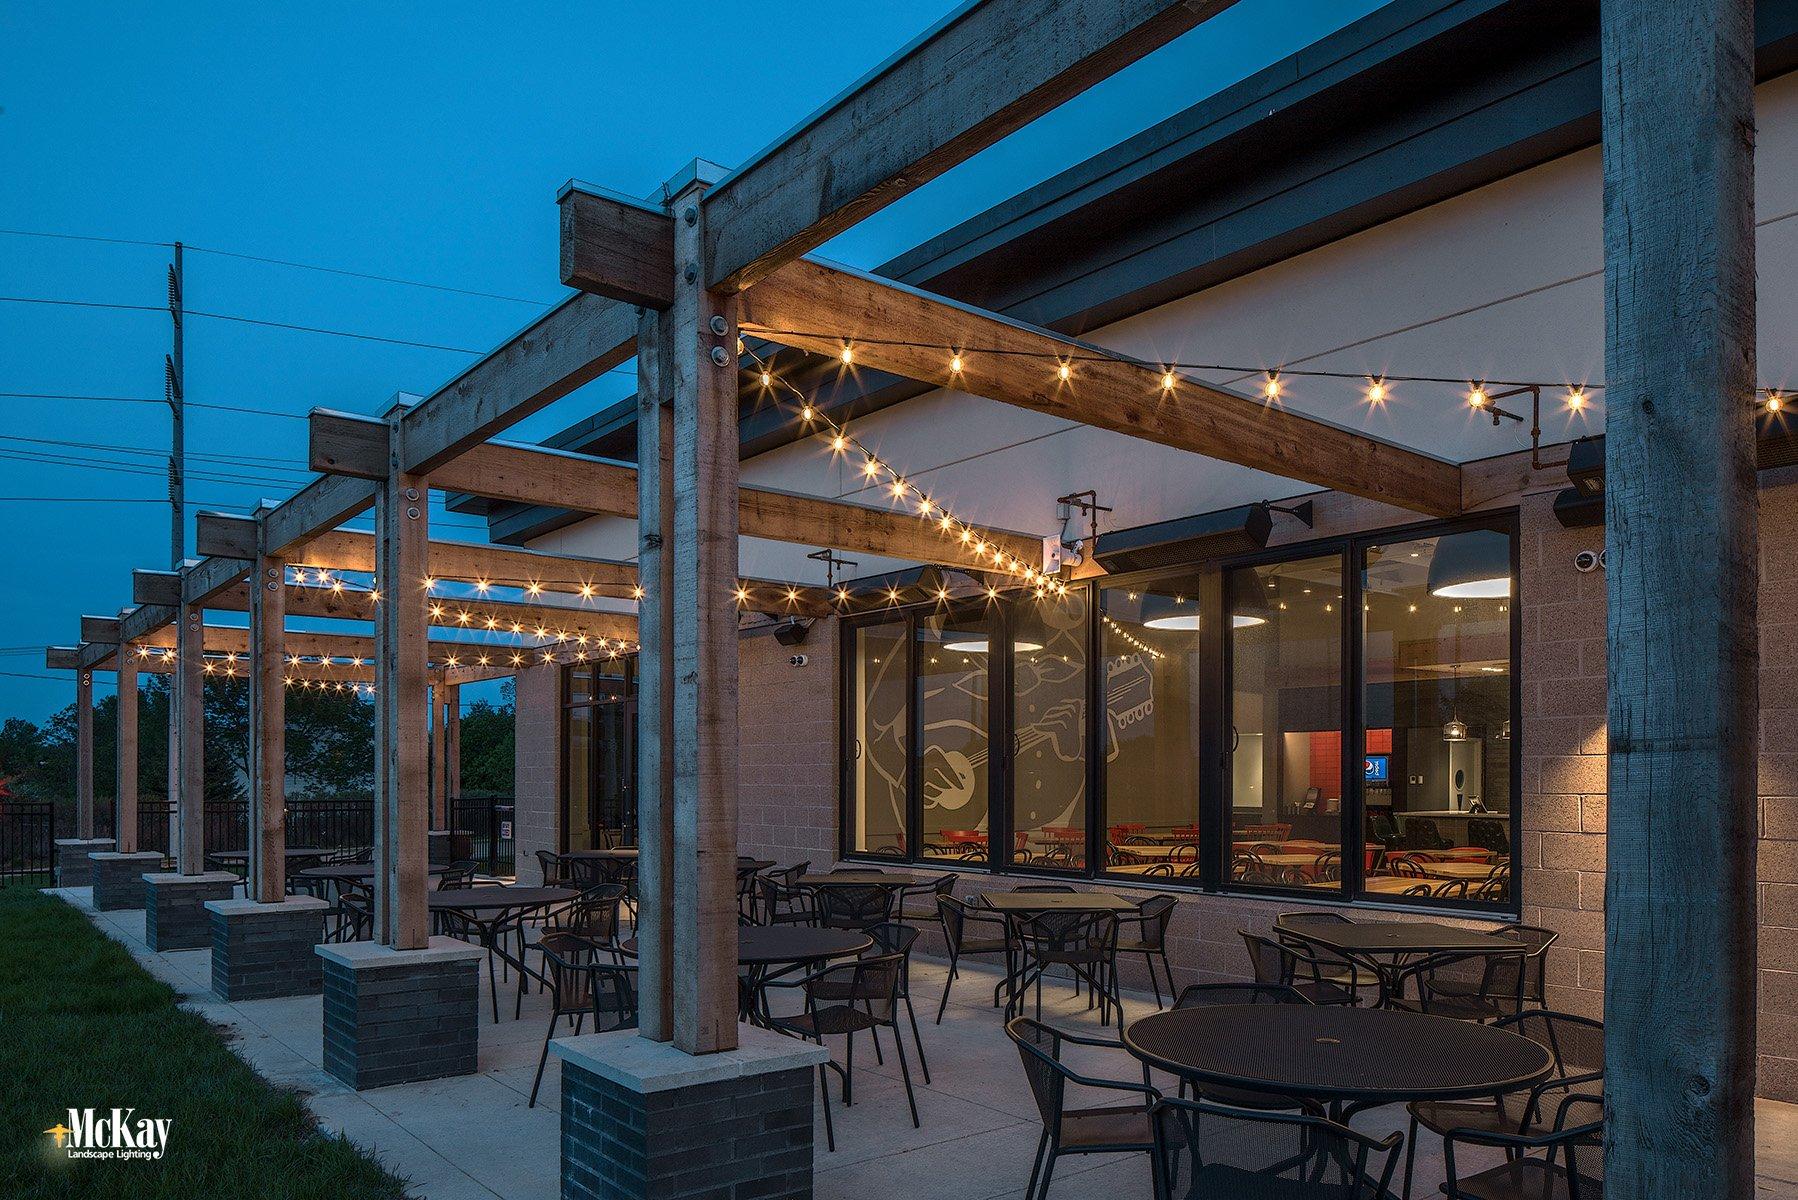 restaurant patio bistro string lighting omaha nebraska La Casa McKay Landscape LightingL 03